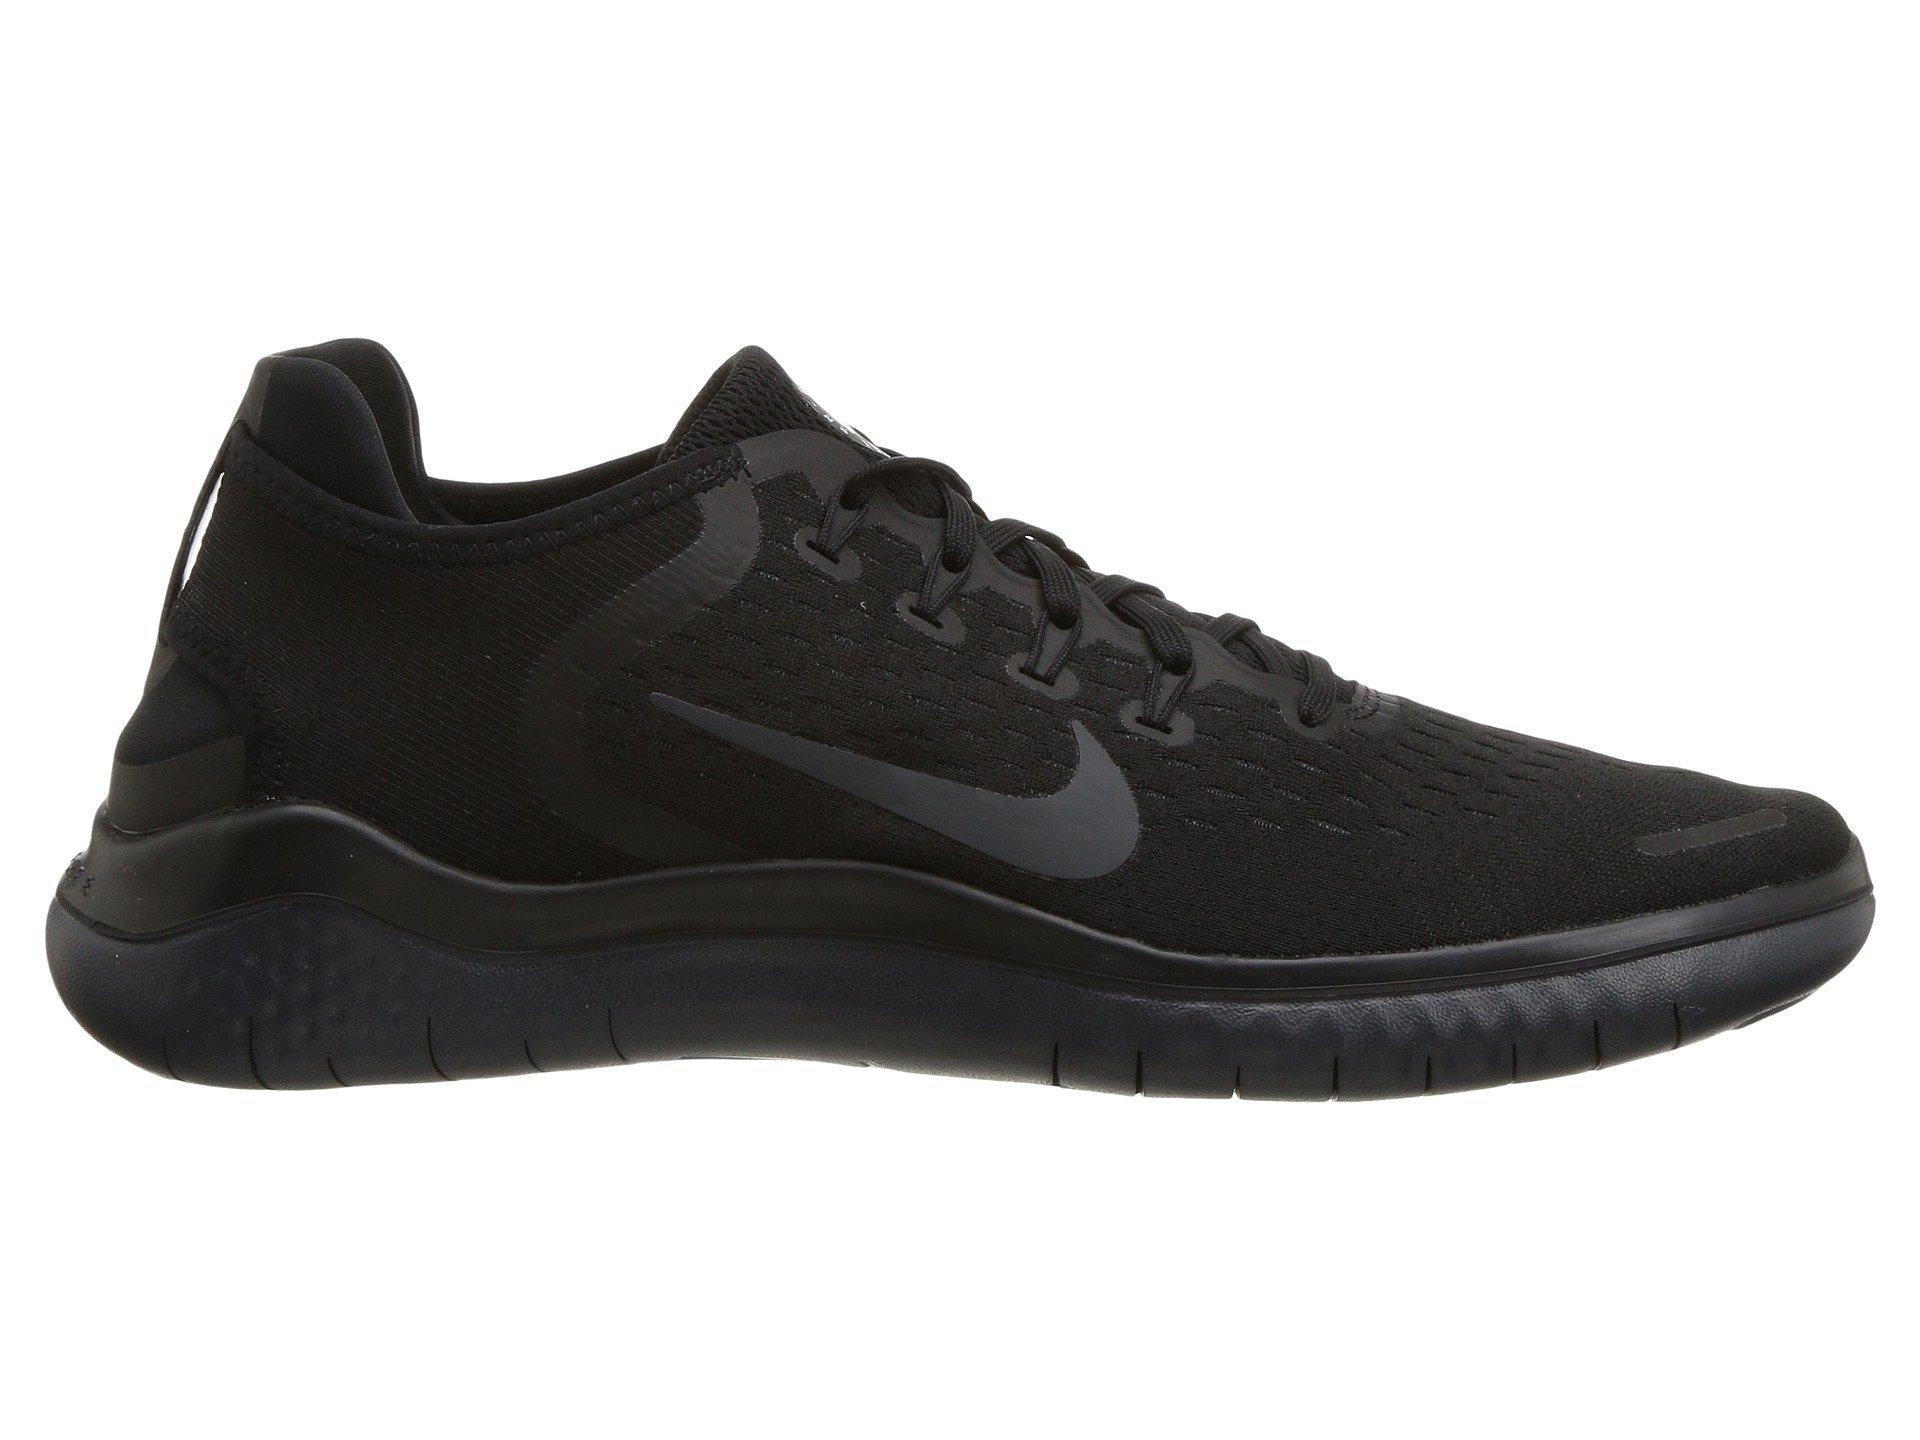 Free Rn 2018 (black/anthracite) Men's Running Shoes